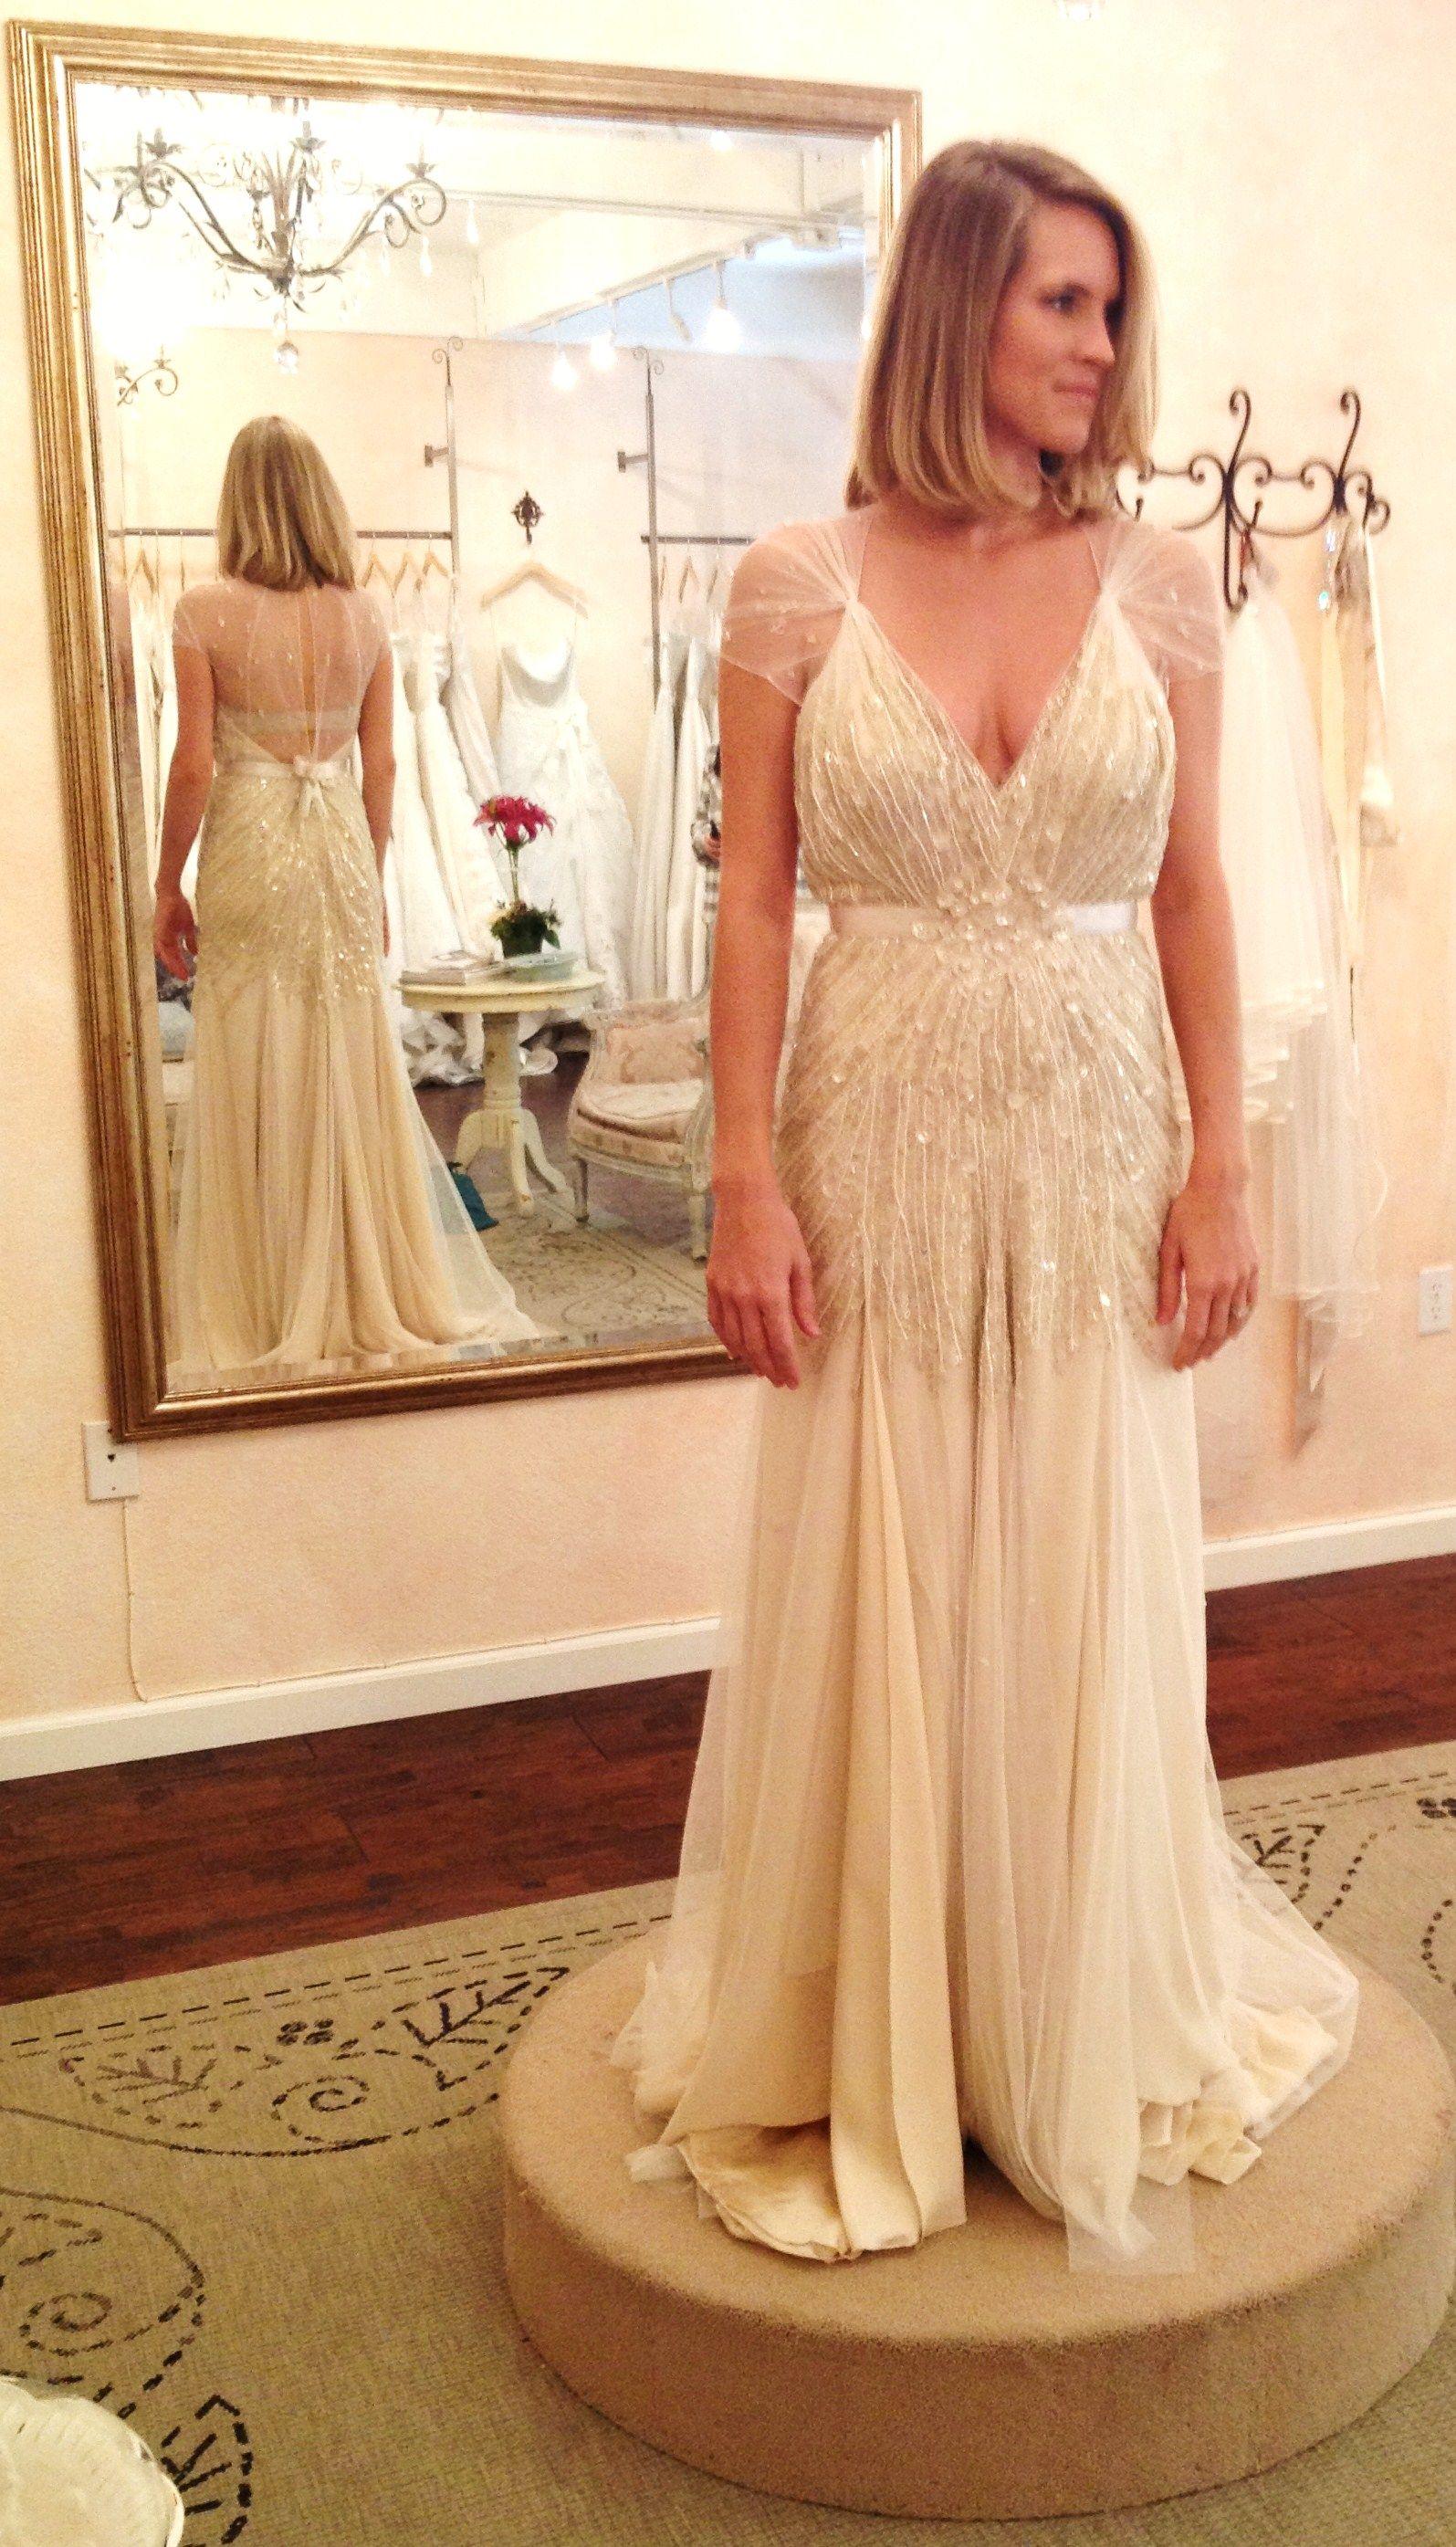 Wedding Dress Jenny Packham Wedding Dresses For Sale 1000 images about wedding dress on pinterest jenny packham alfred angelo and dresses